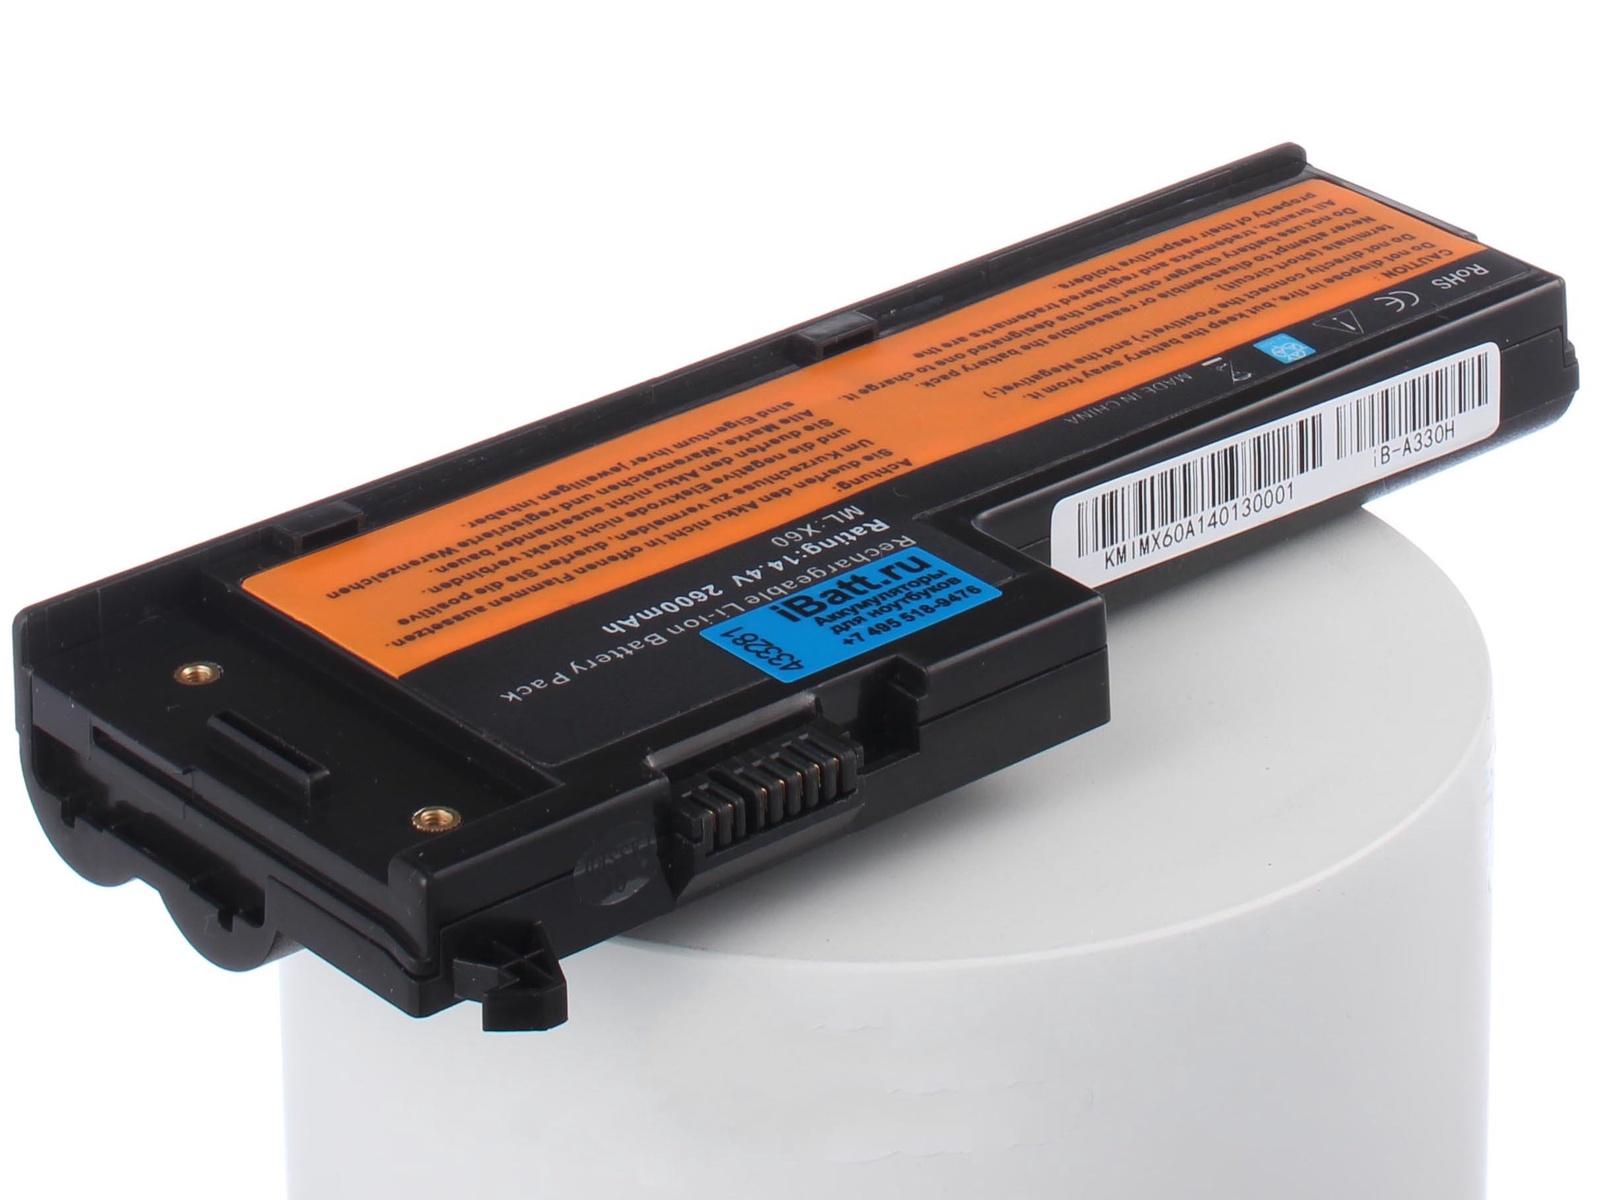 Фото - Аккумулятор для ноутбука iBatt iBM-Lenovo 93P5032, 92P1166, 40Y6999, 92P1163, 40Y7003, 40Y7001, 42T4505, 93P5030, 42T5247, 92P1165 аккумулятор